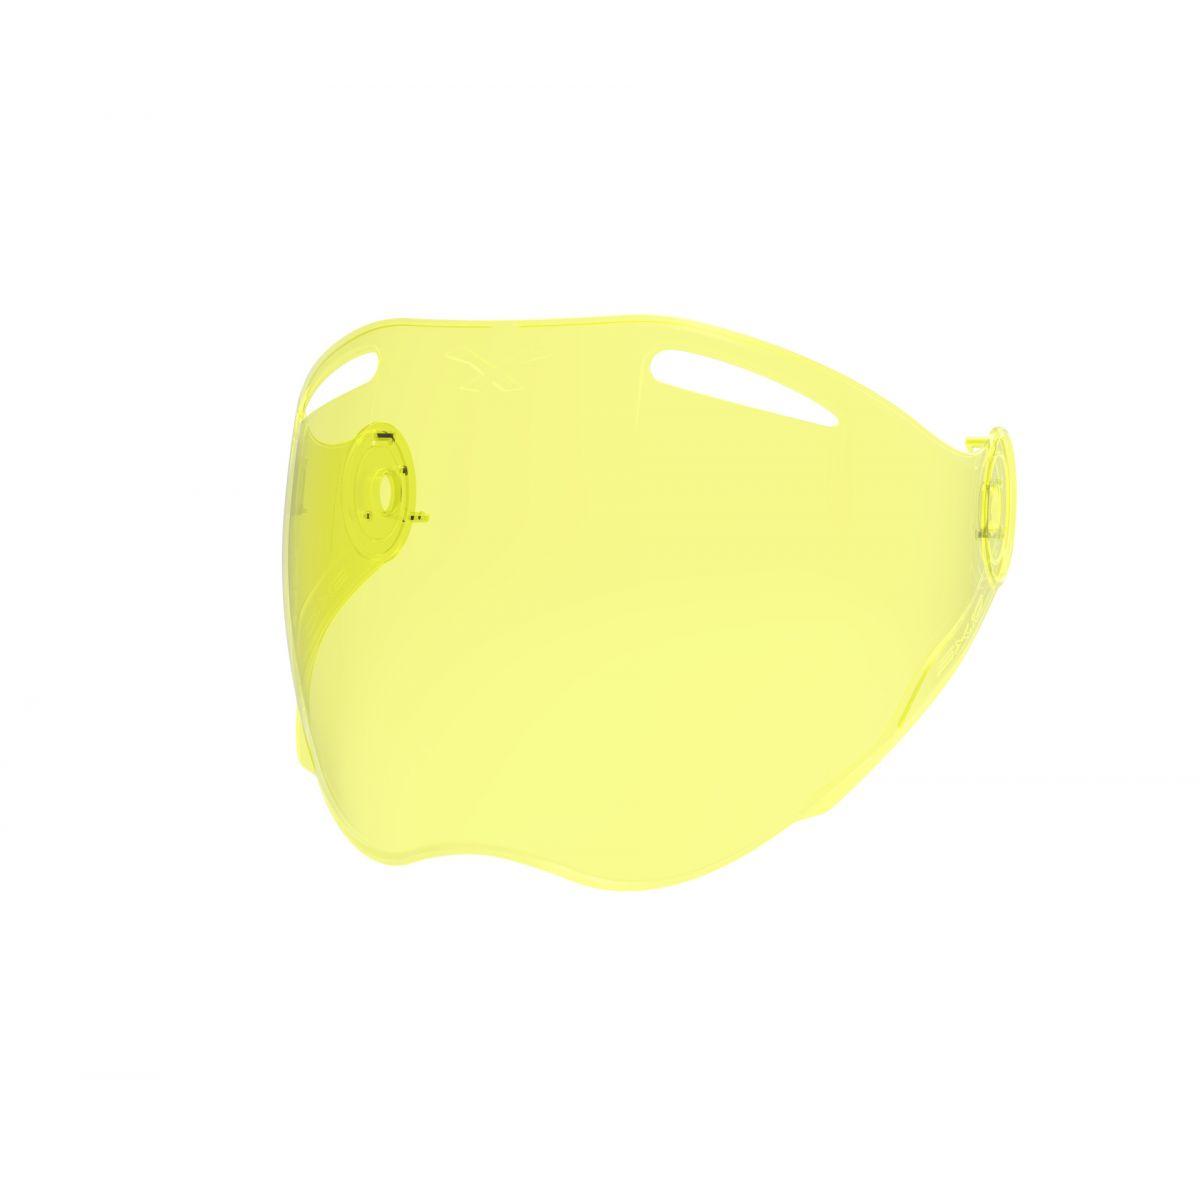 Viseira Nexx SX10 - Amarelo  - Nova Suzuki Motos e Acessórios